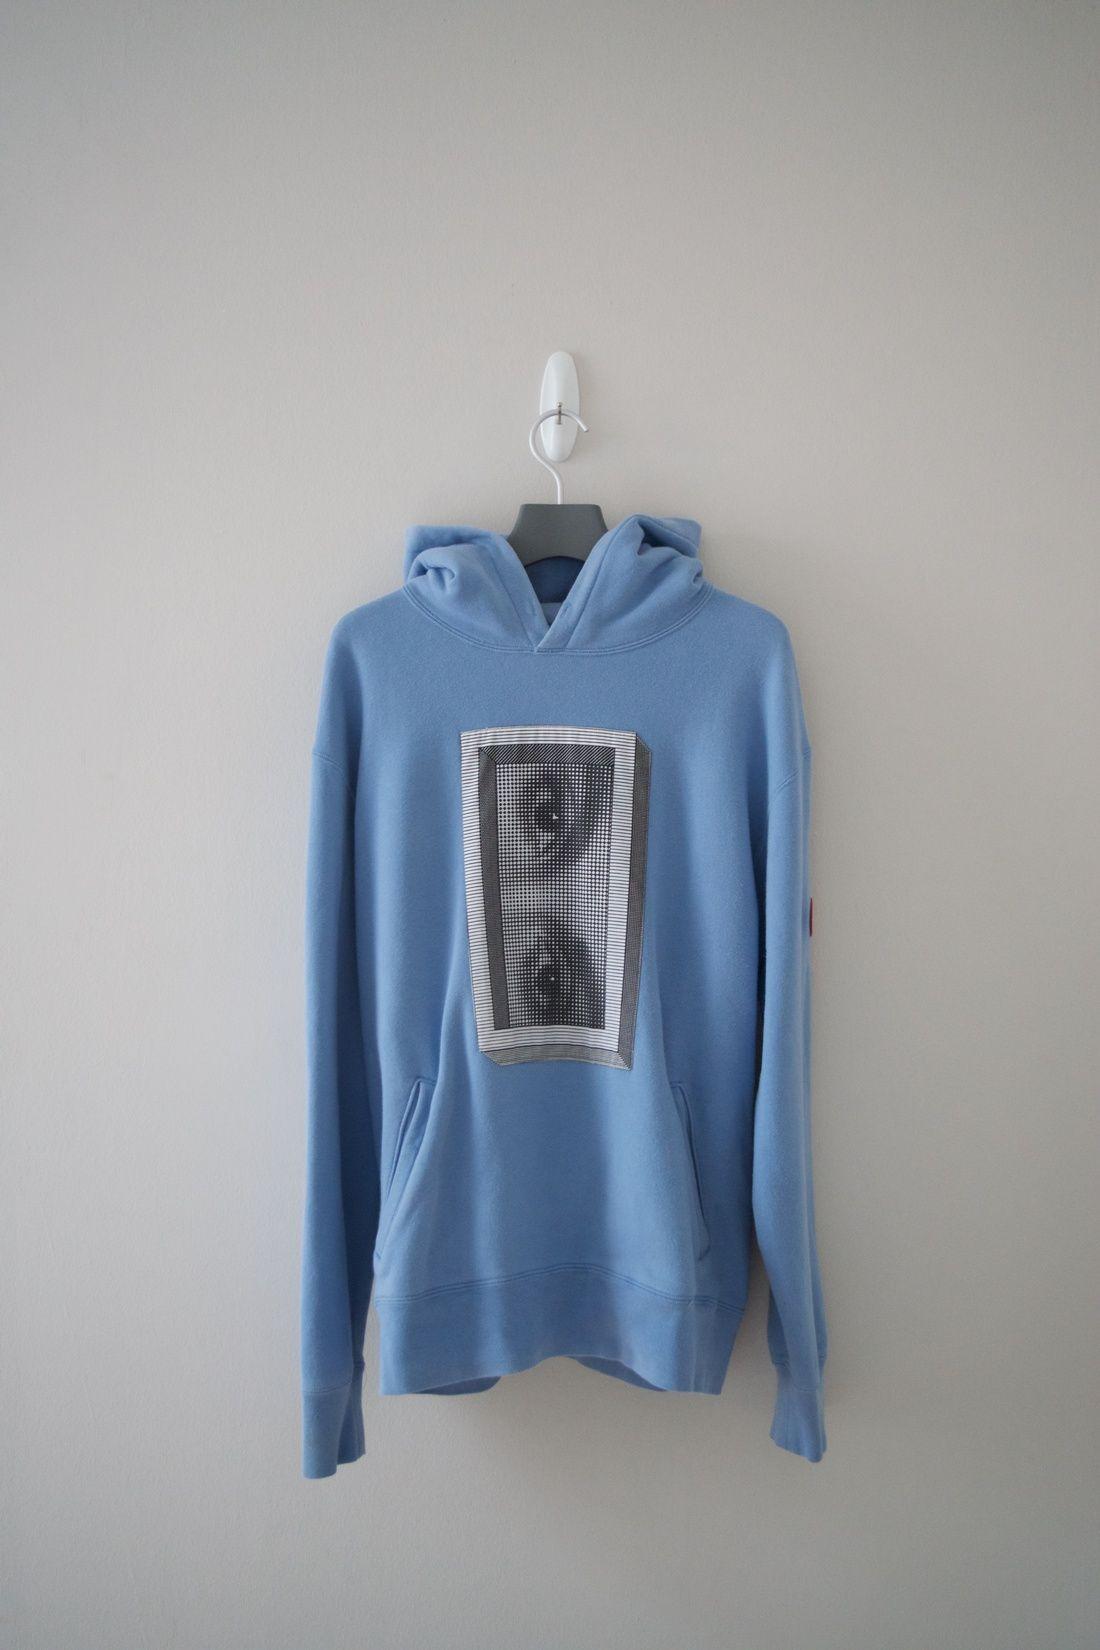 11e9a3f4d860 2014 - Blue Icon Hoodie | Hoodie | Hoodies, Blue, Fashion brands